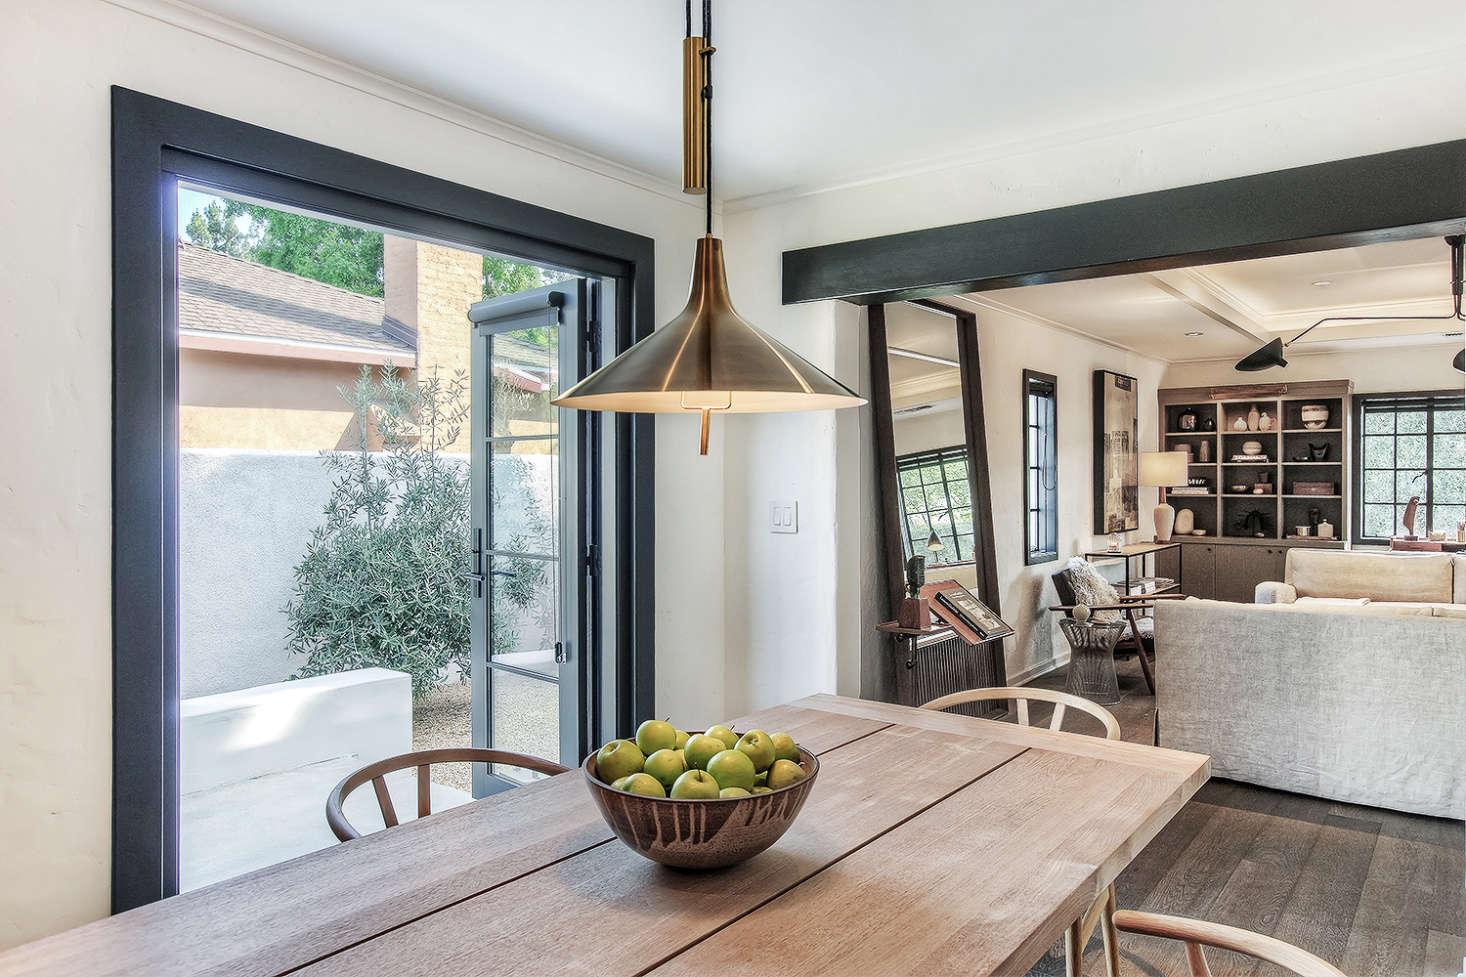 Best Professional Living Dining Space Spanish Bungalow Redux By Herringbone Design Remodelista